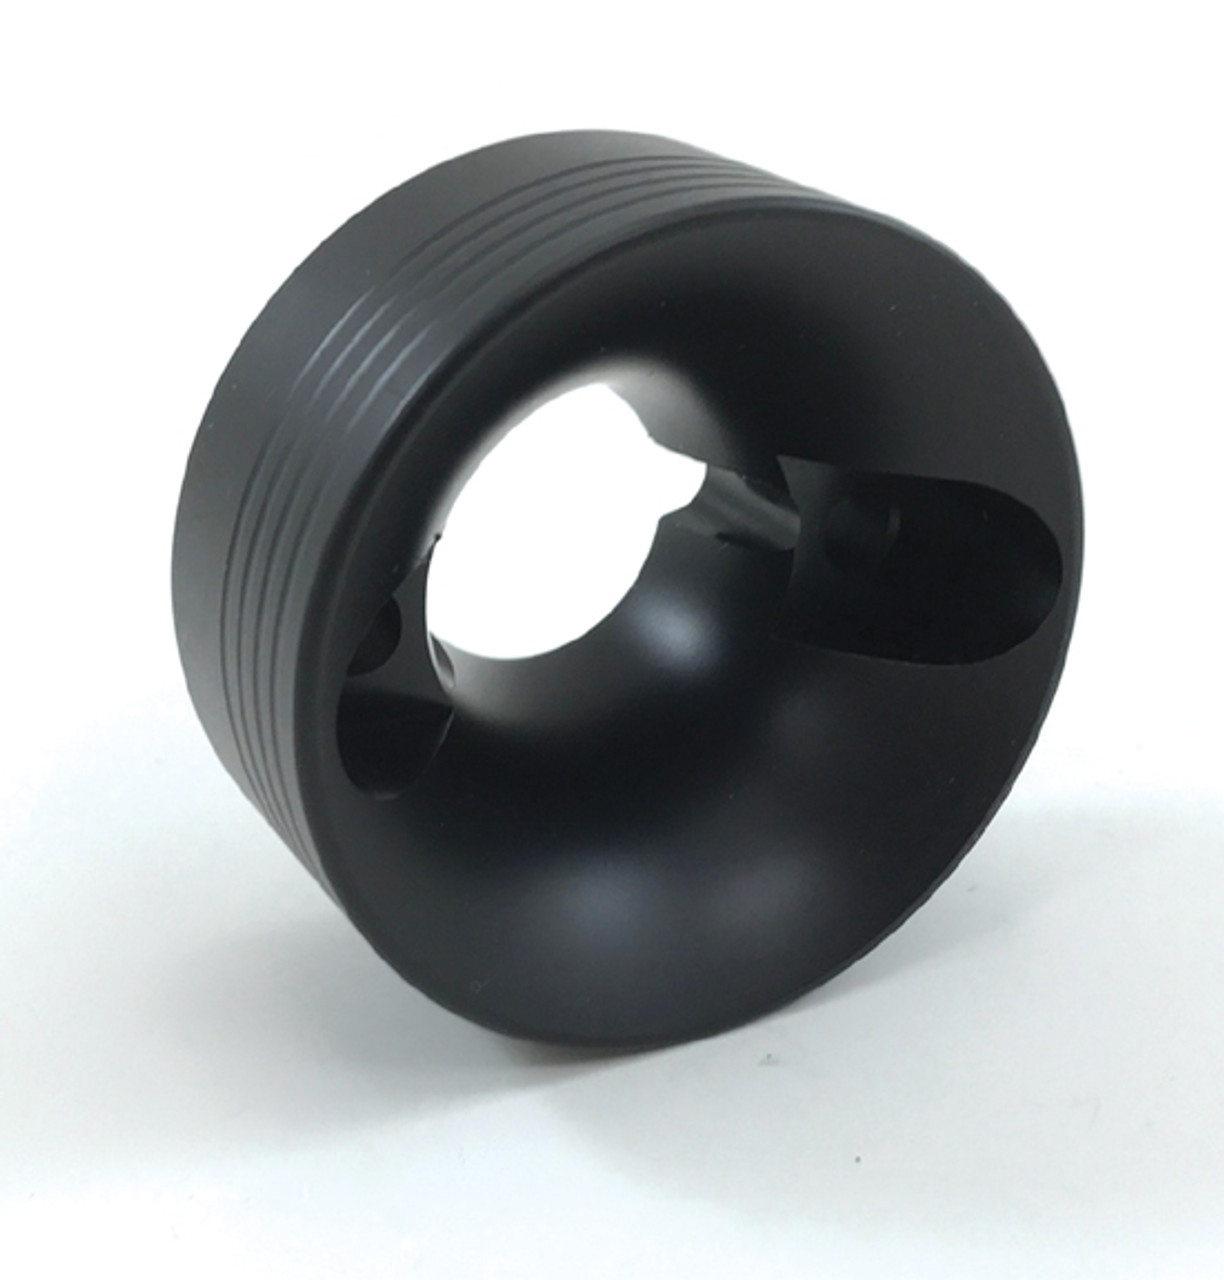 Clone Aluminum Filter Adapter - 2-7/16'' OD